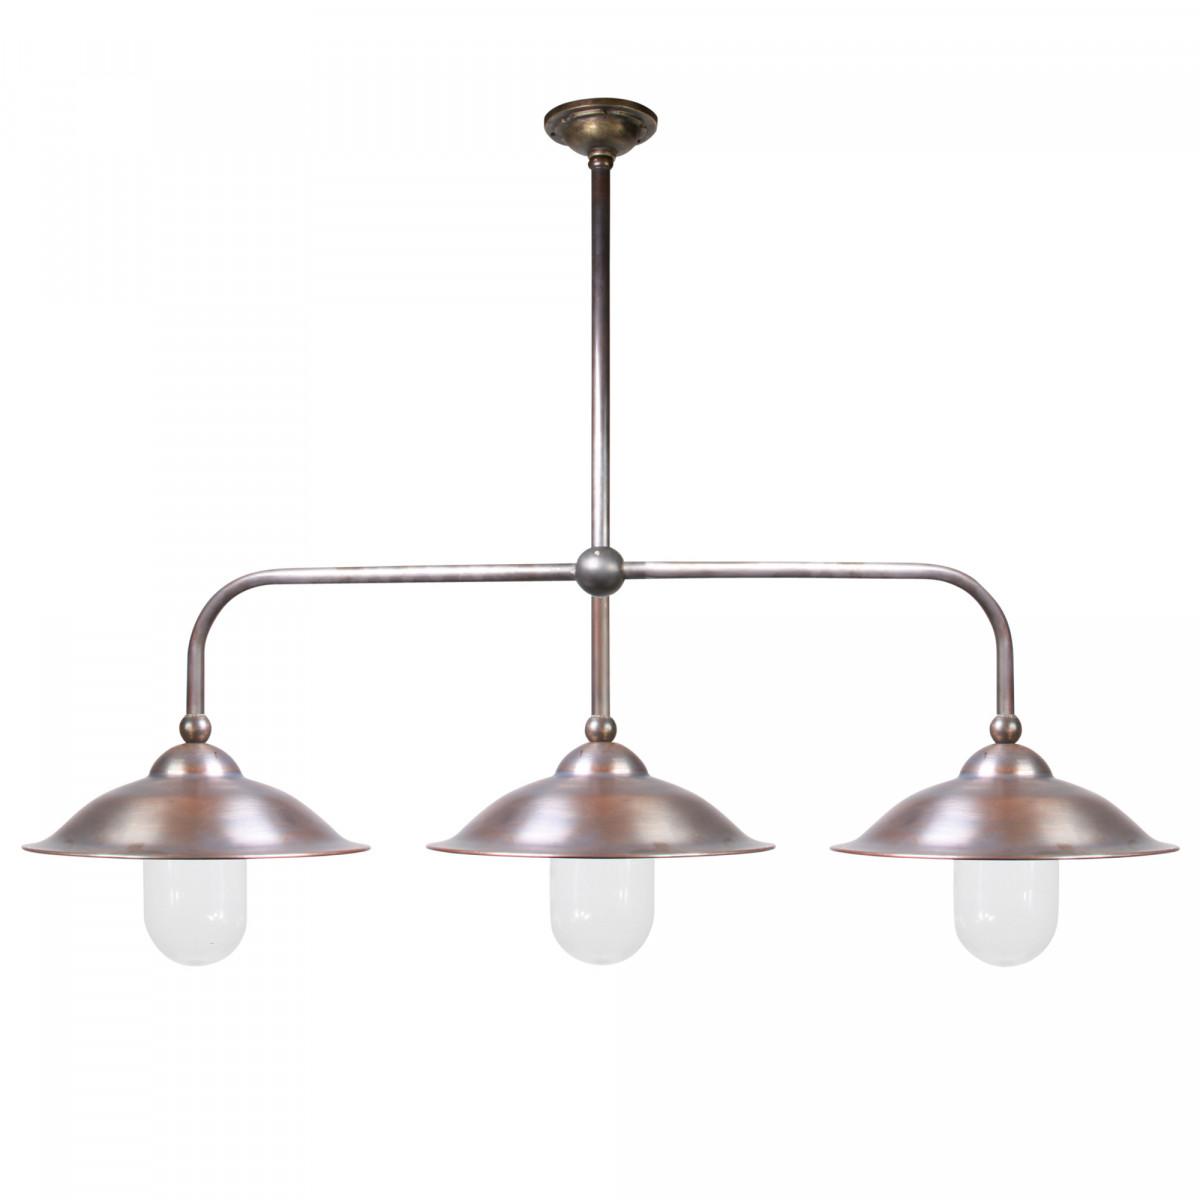 BuitenlampVienna 3-lichts 130cm